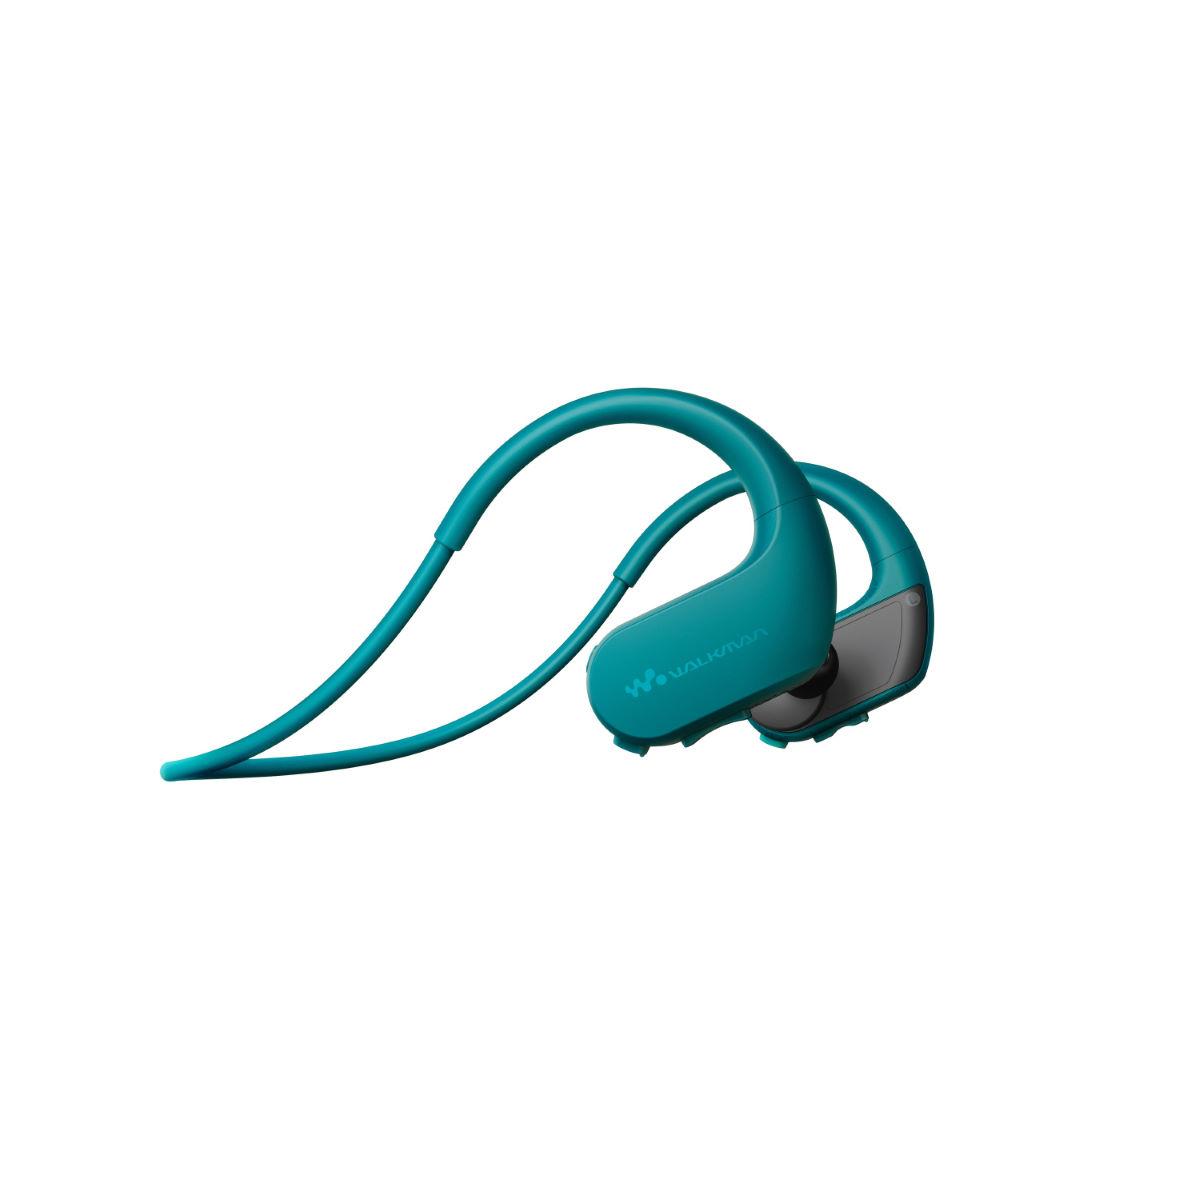 Auriculares con MP3 Sony Waterproof Sports (4GB, impermeables) - Equipos de sonido